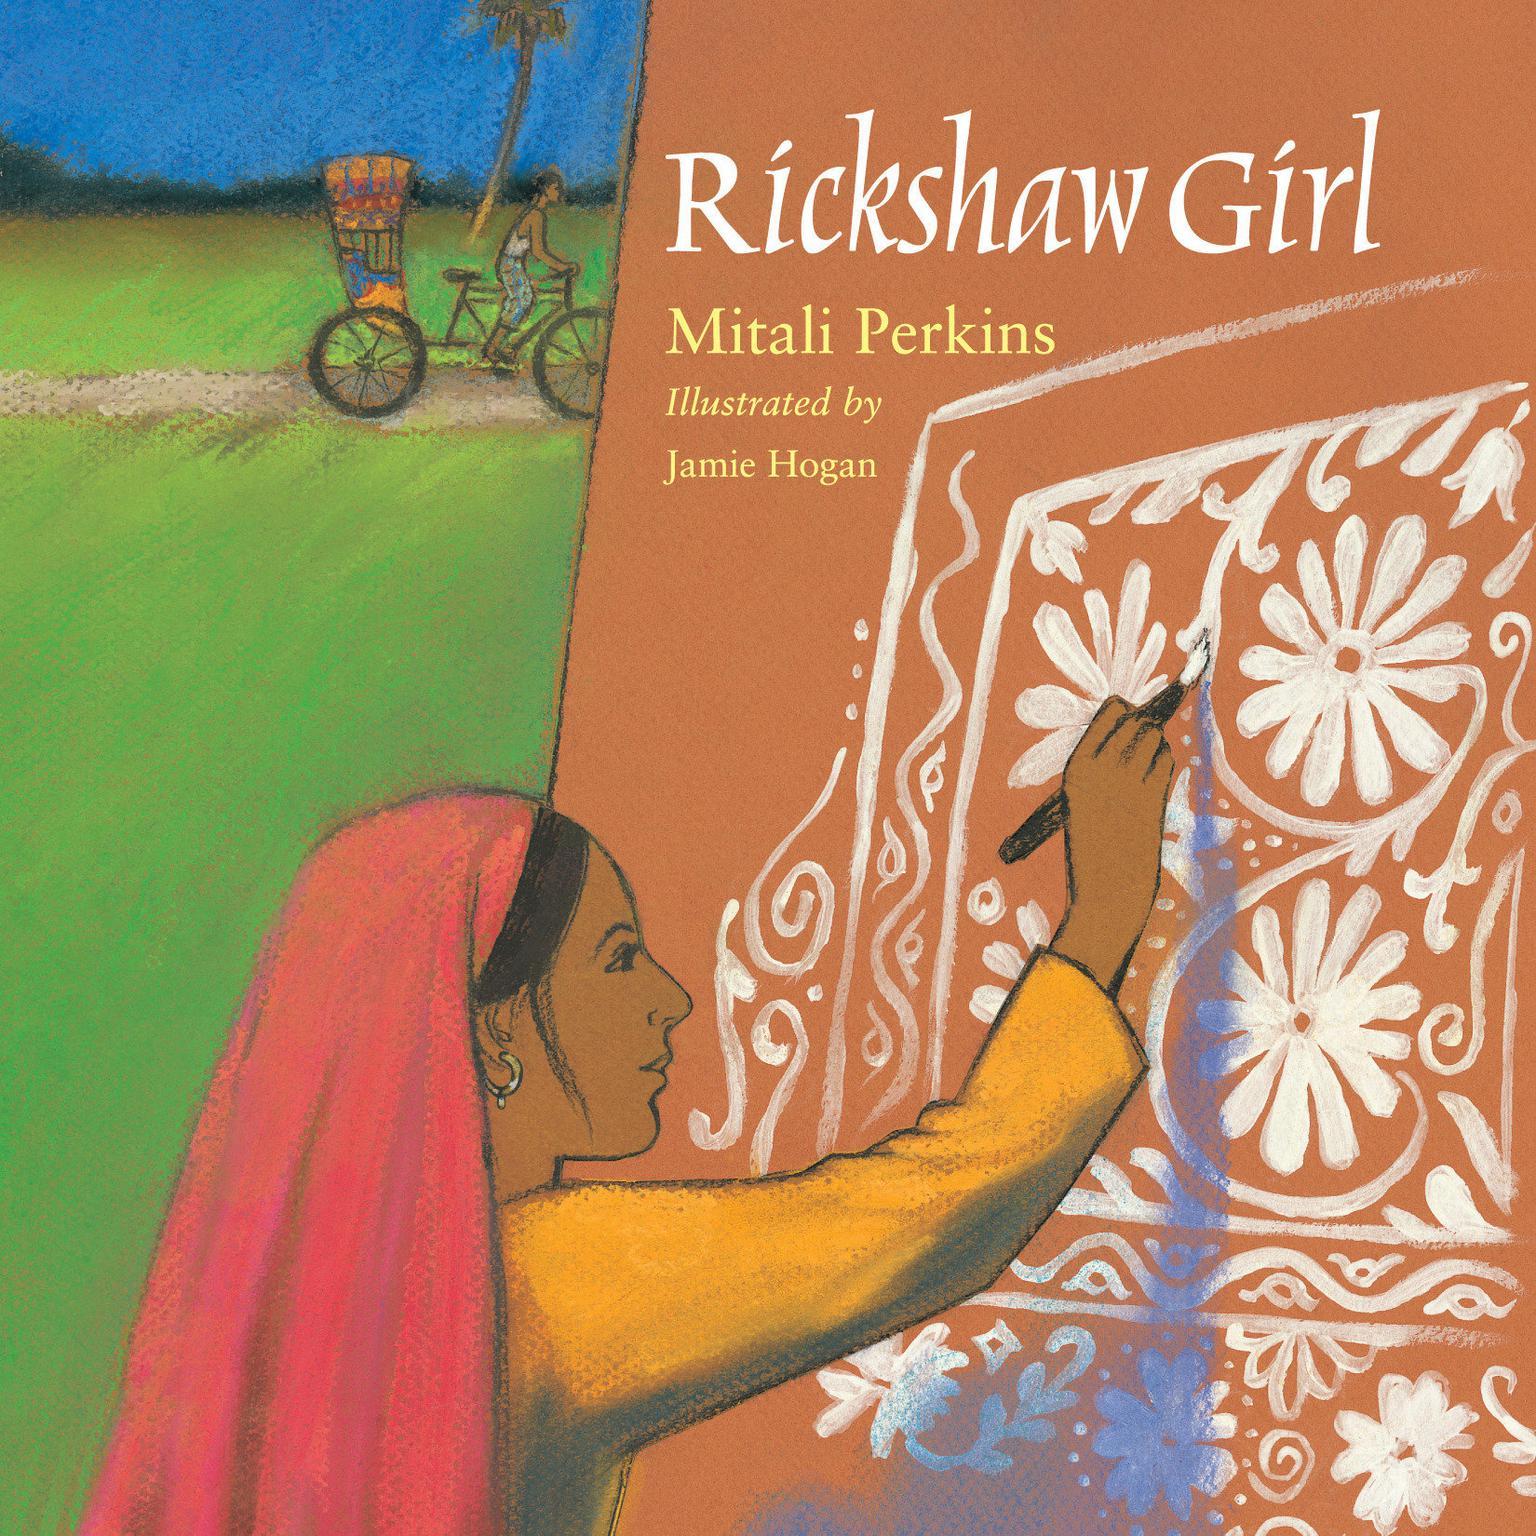 Rickshaw Girl Audiobook, by Mitali Perkins